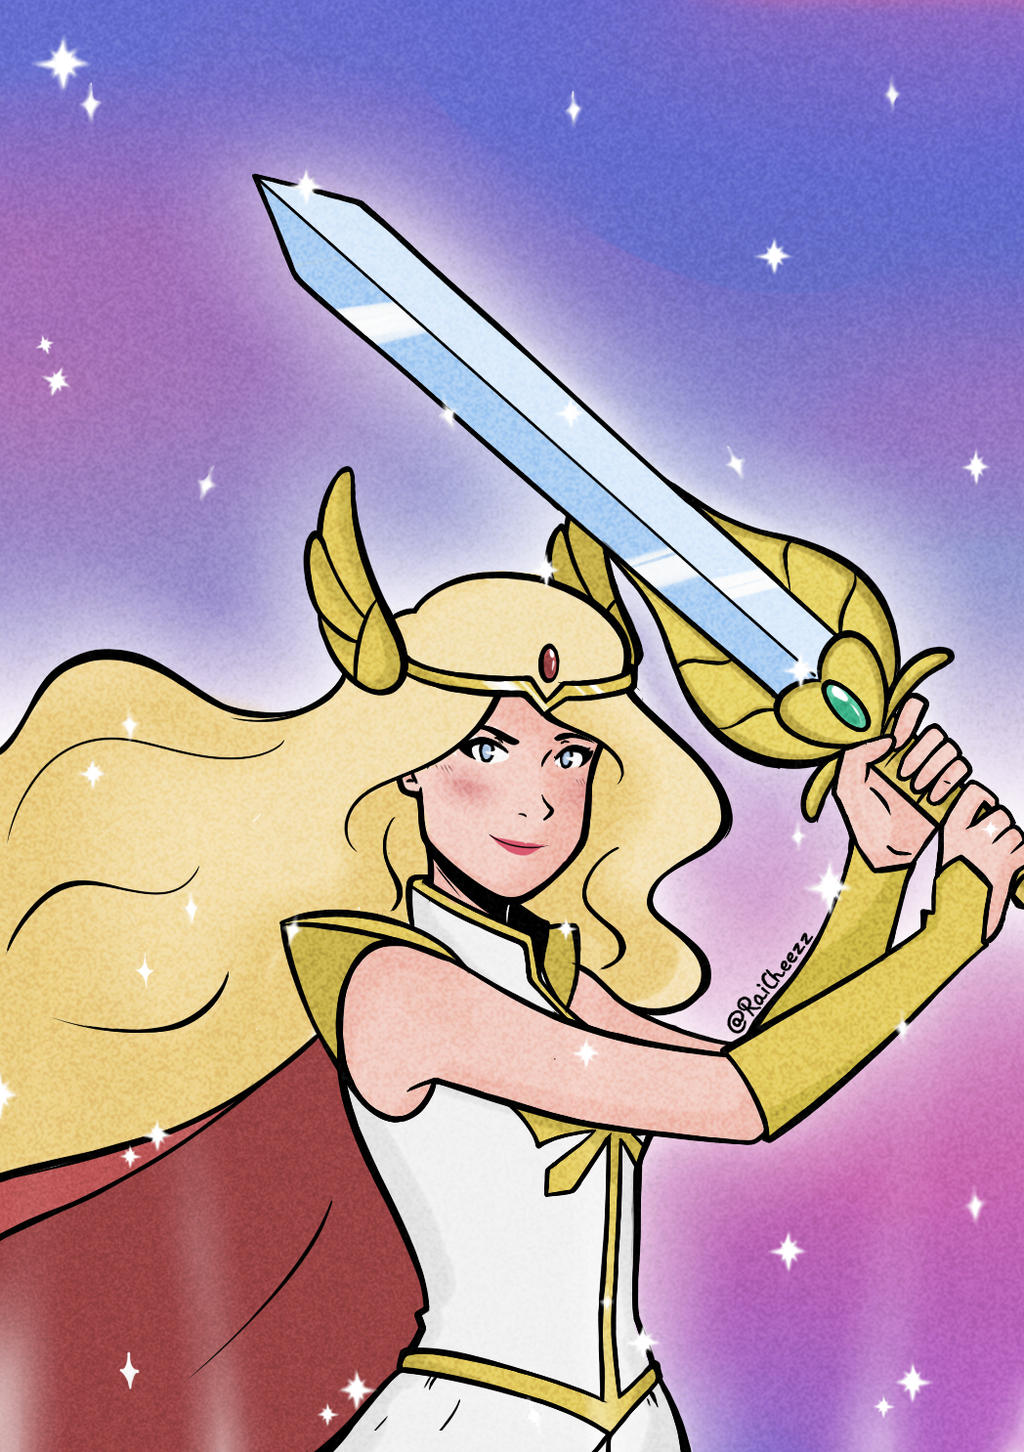 Fanart She Ra And The Princesses Of Power By Raicheezz On Deviantart